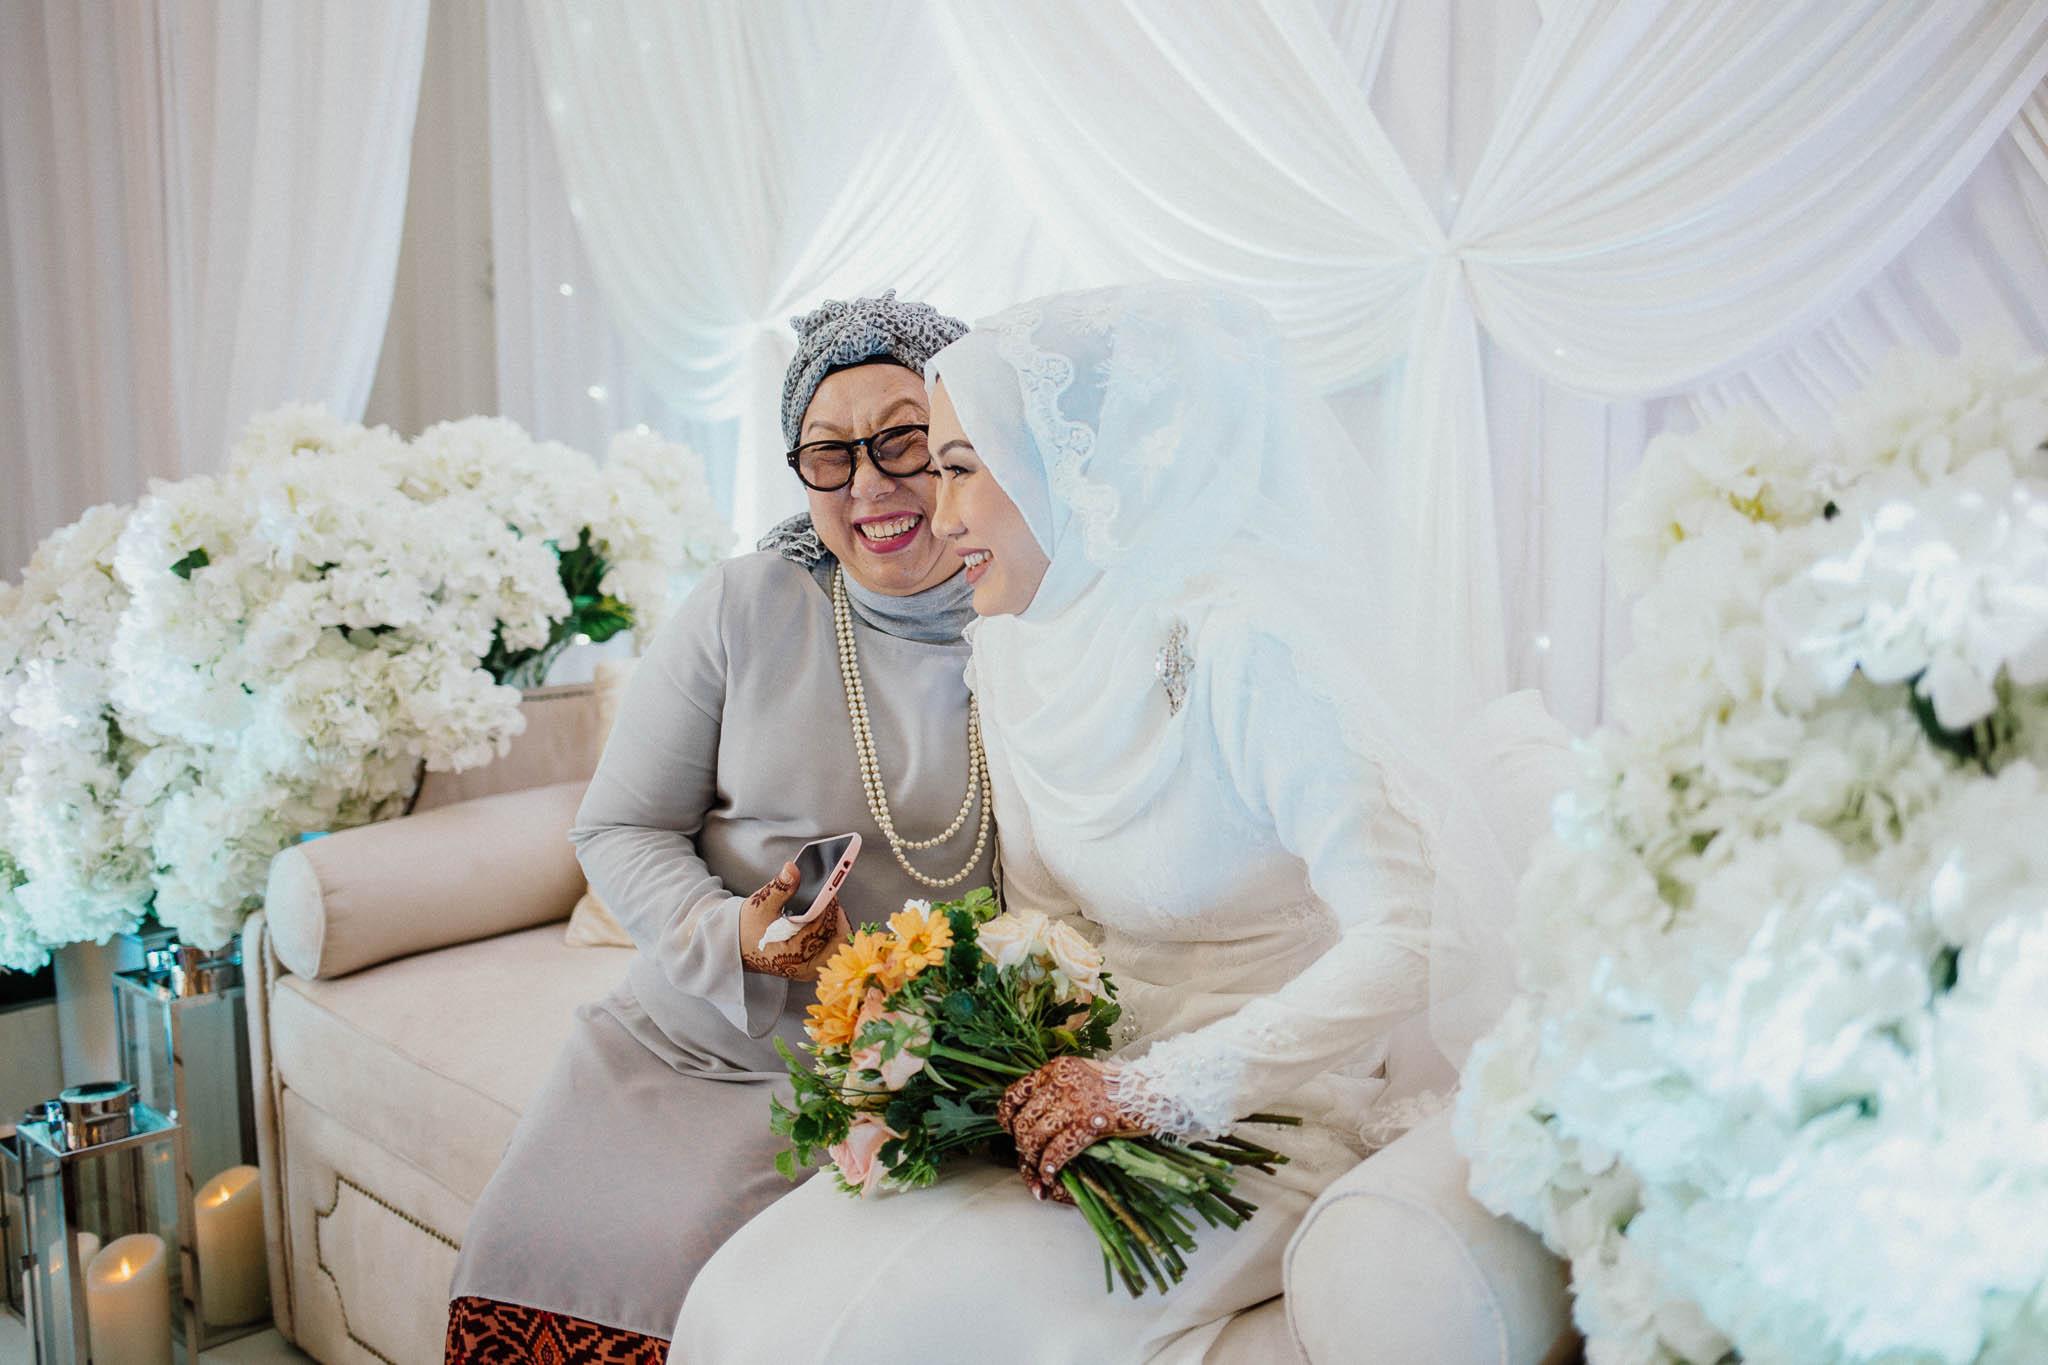 singapore-wedding-photographer-wedding-nufail-addafiq-015.jpg